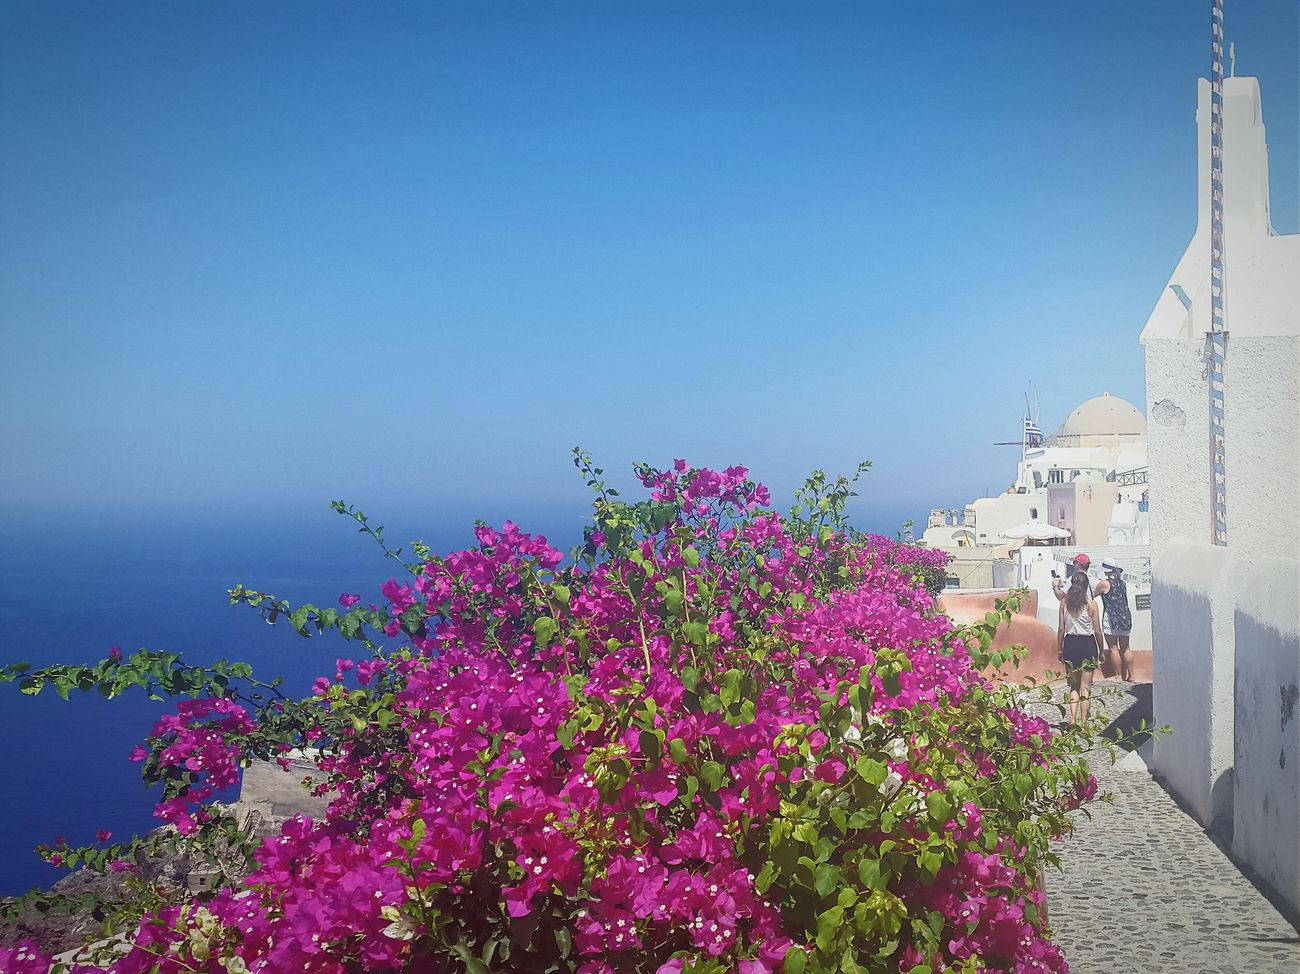 Oia Santorini Santorini, Greece Santorini Island Greece Flowers Flowerpower Seaside Holiday Sunny Day